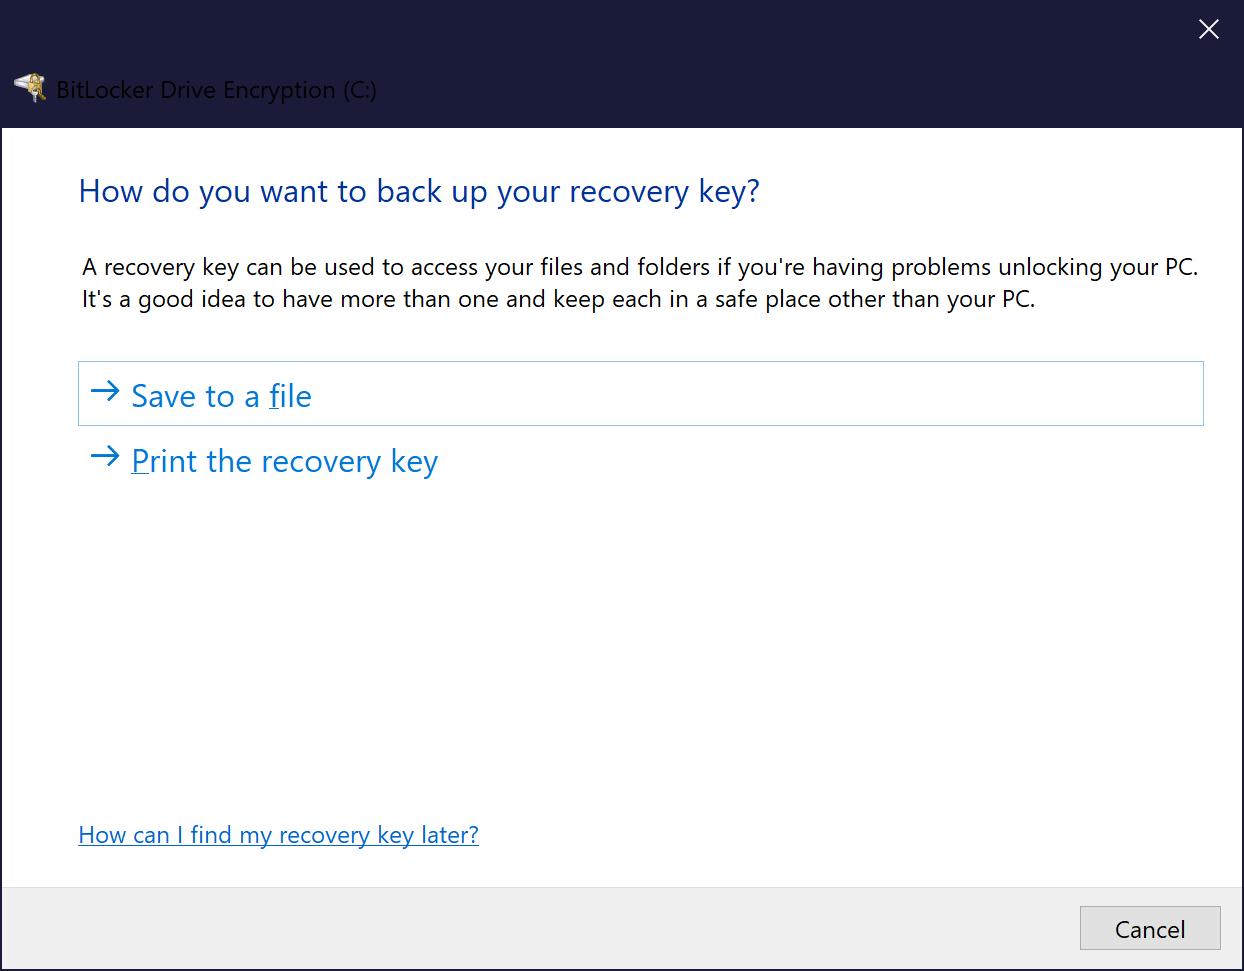 No option to save BitLocker recovery key to Microsoft account 26b44c91-b661-41b1-998f-f12ce3056bc2?upload=true.png